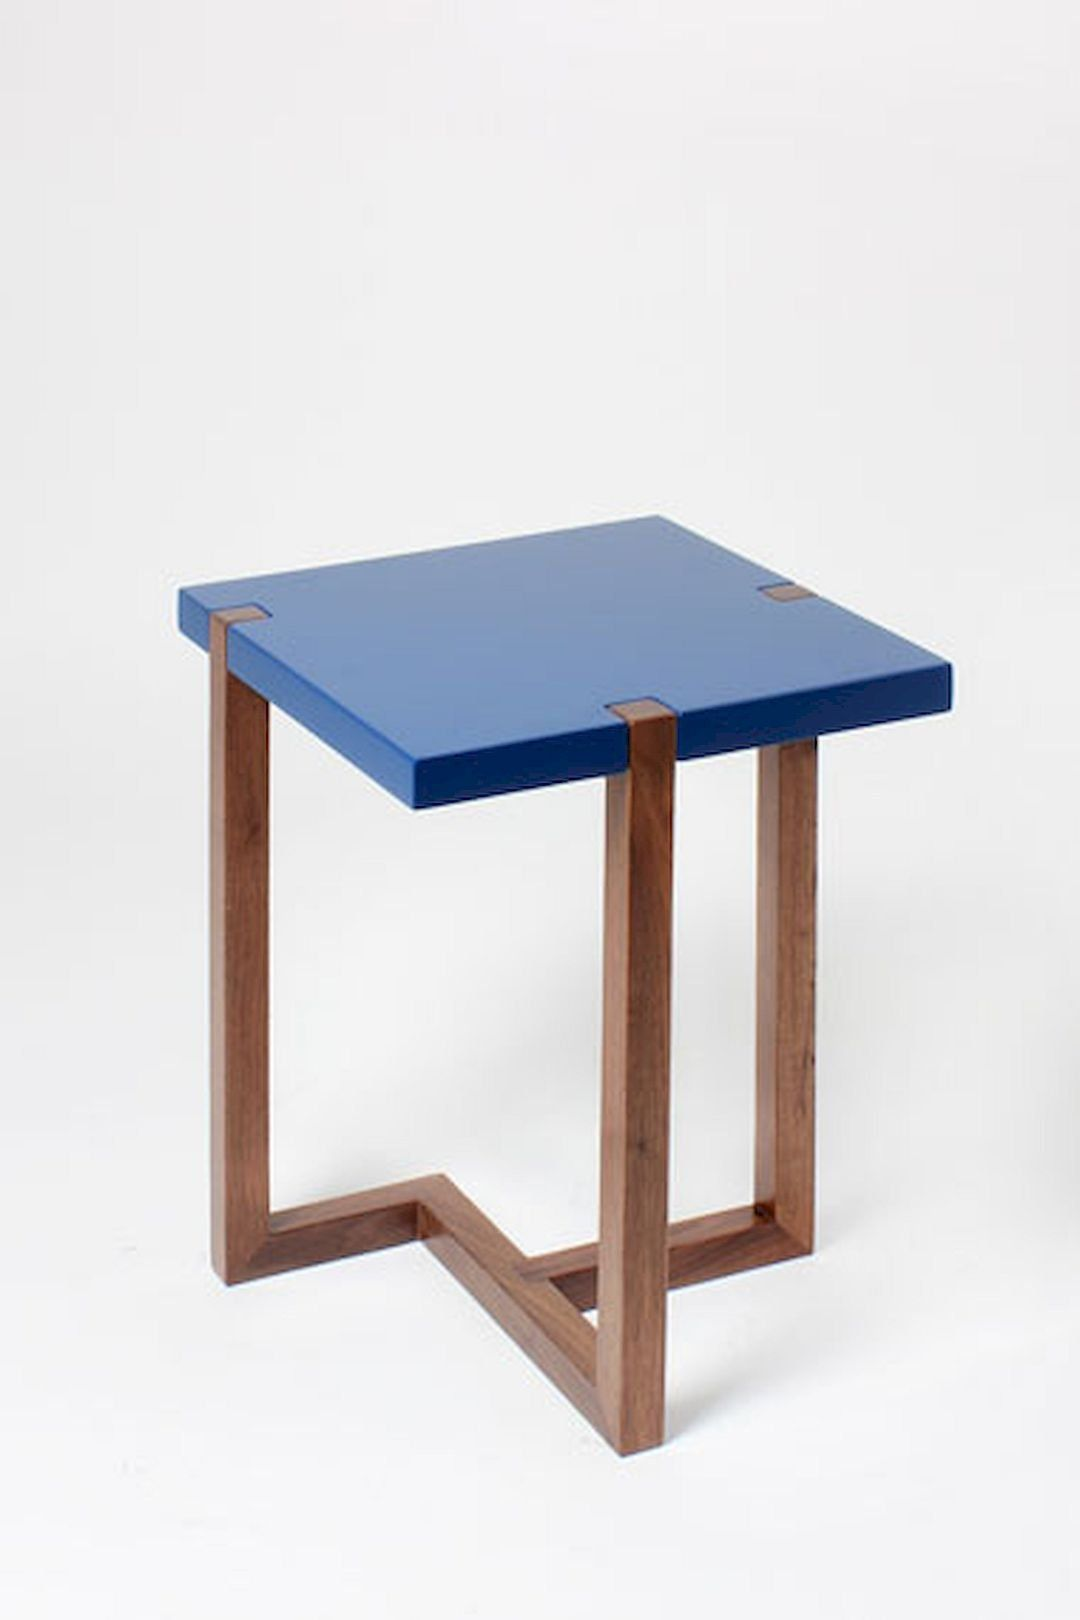 104 amazing modern chair design ideas furniture design ideas rh pinterest com